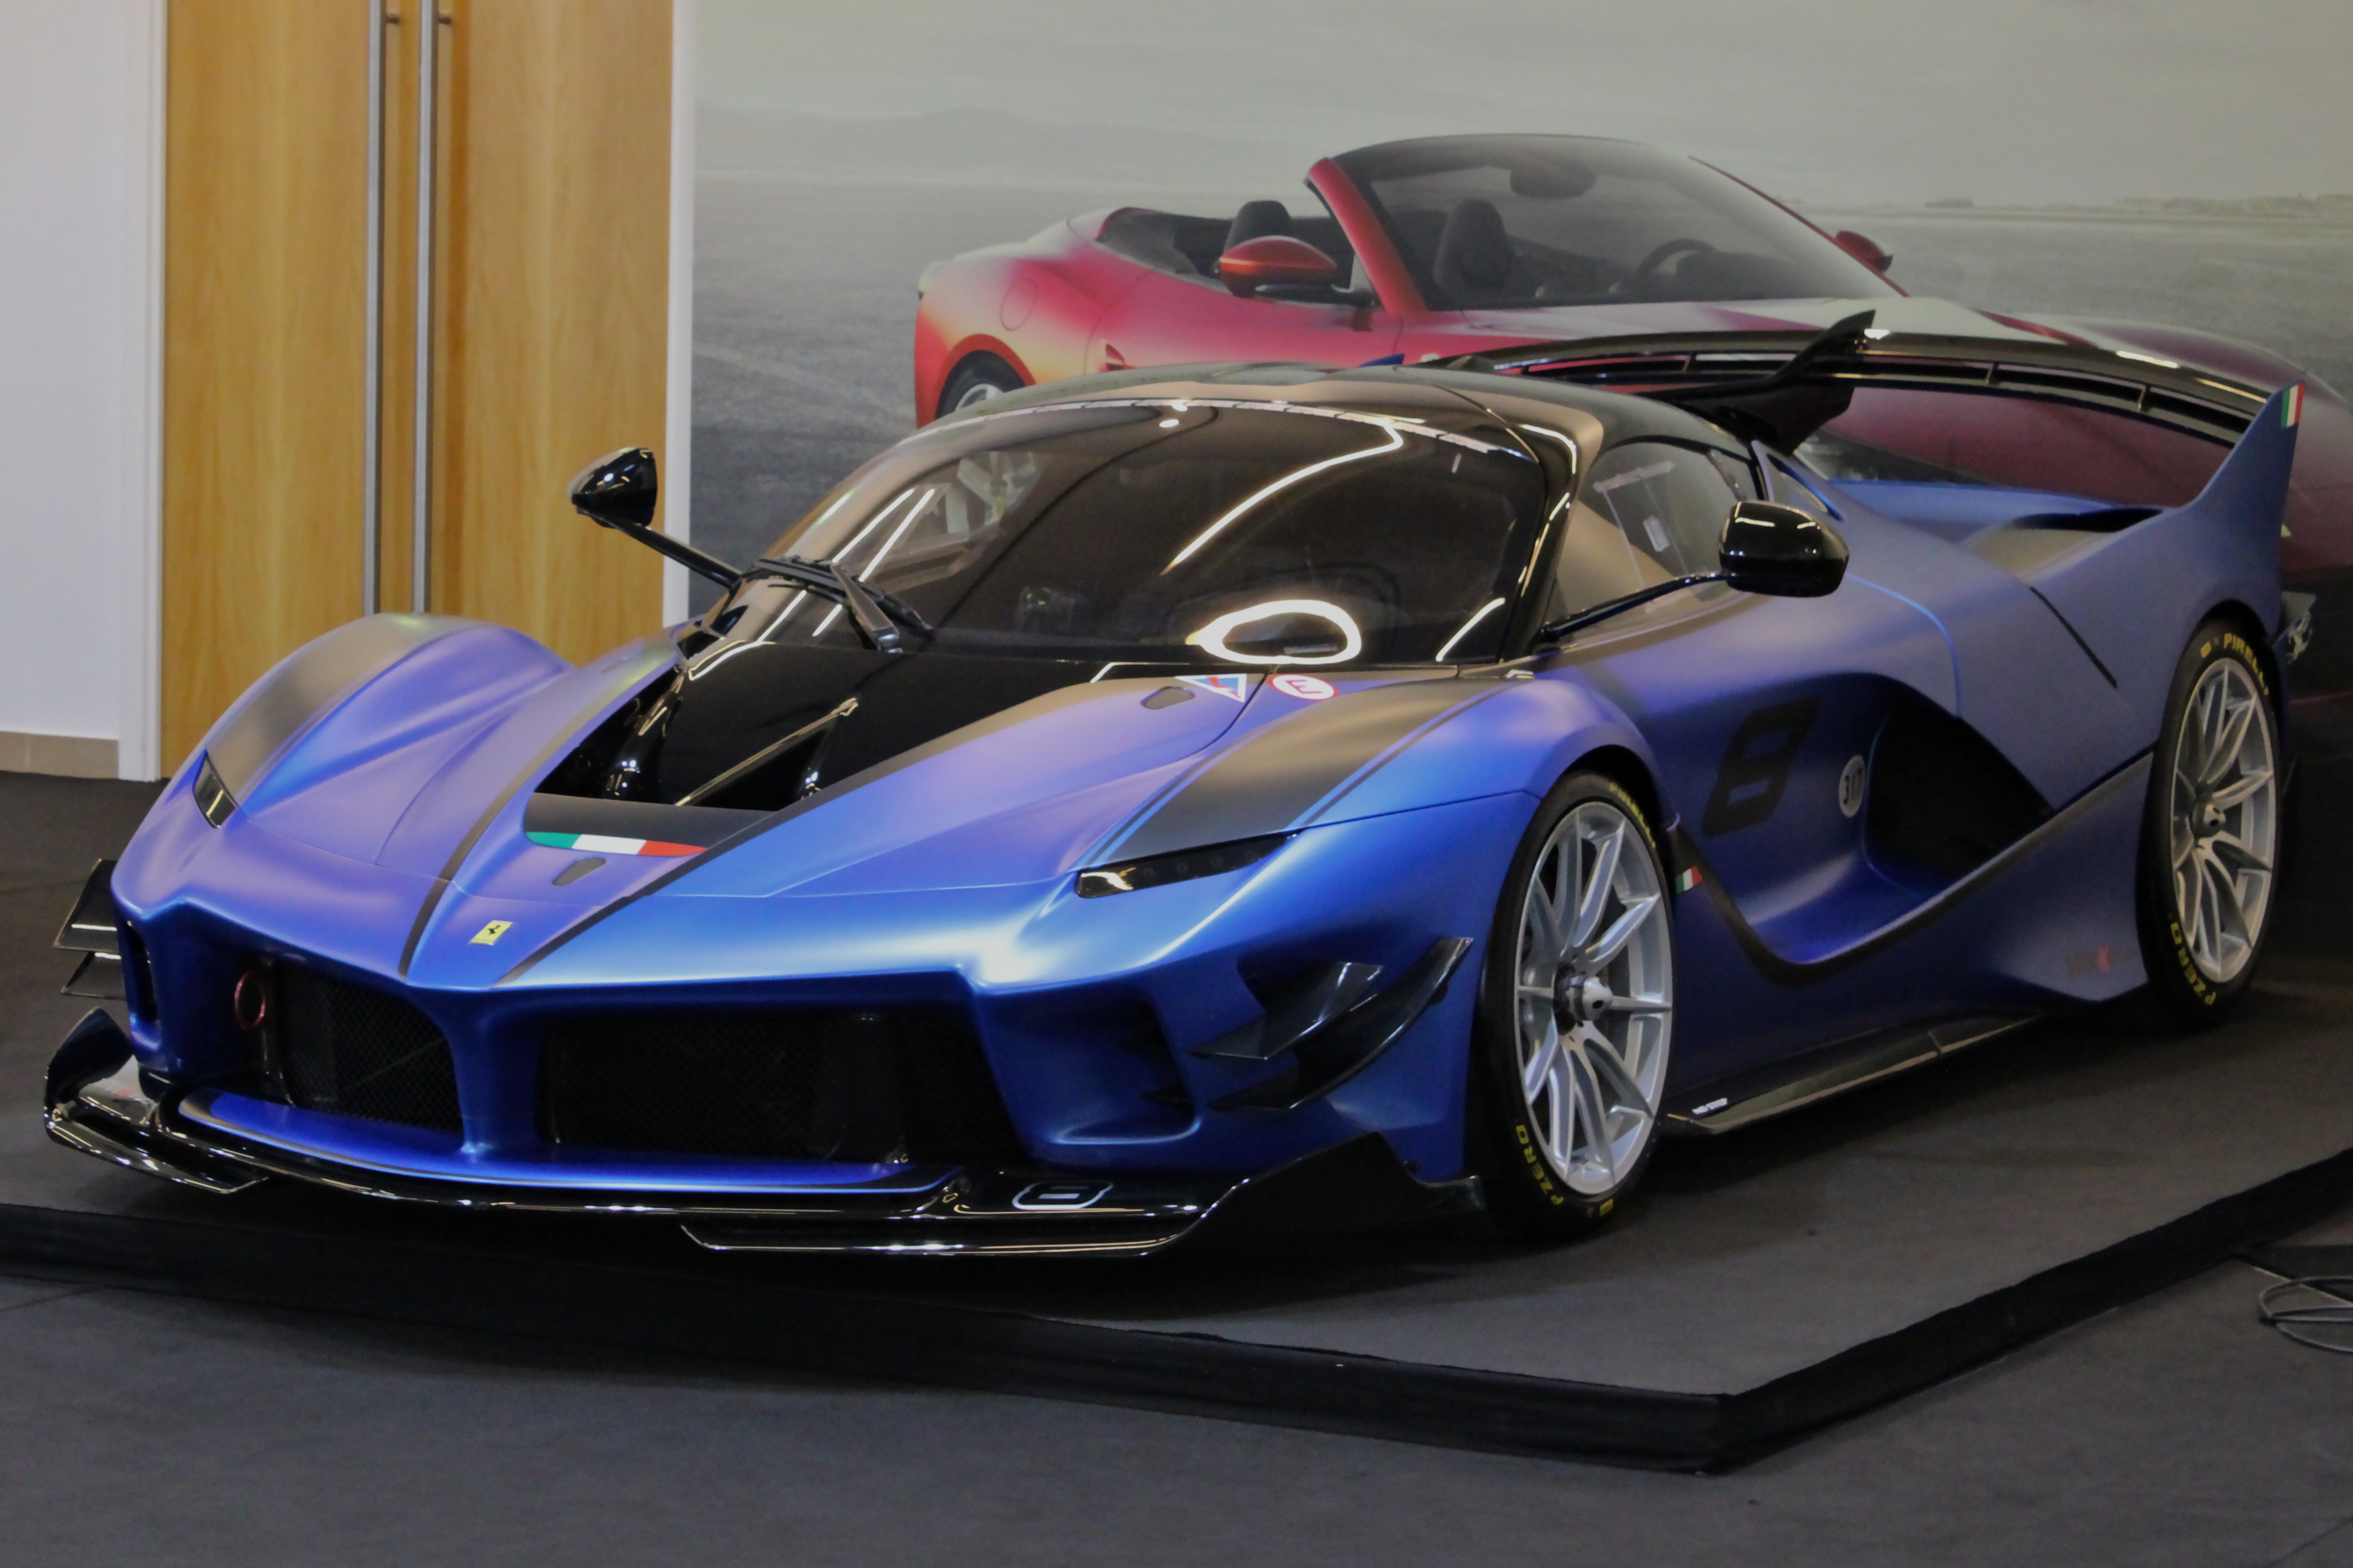 Ferrari Fxx K Albumccars Cars Images Collection